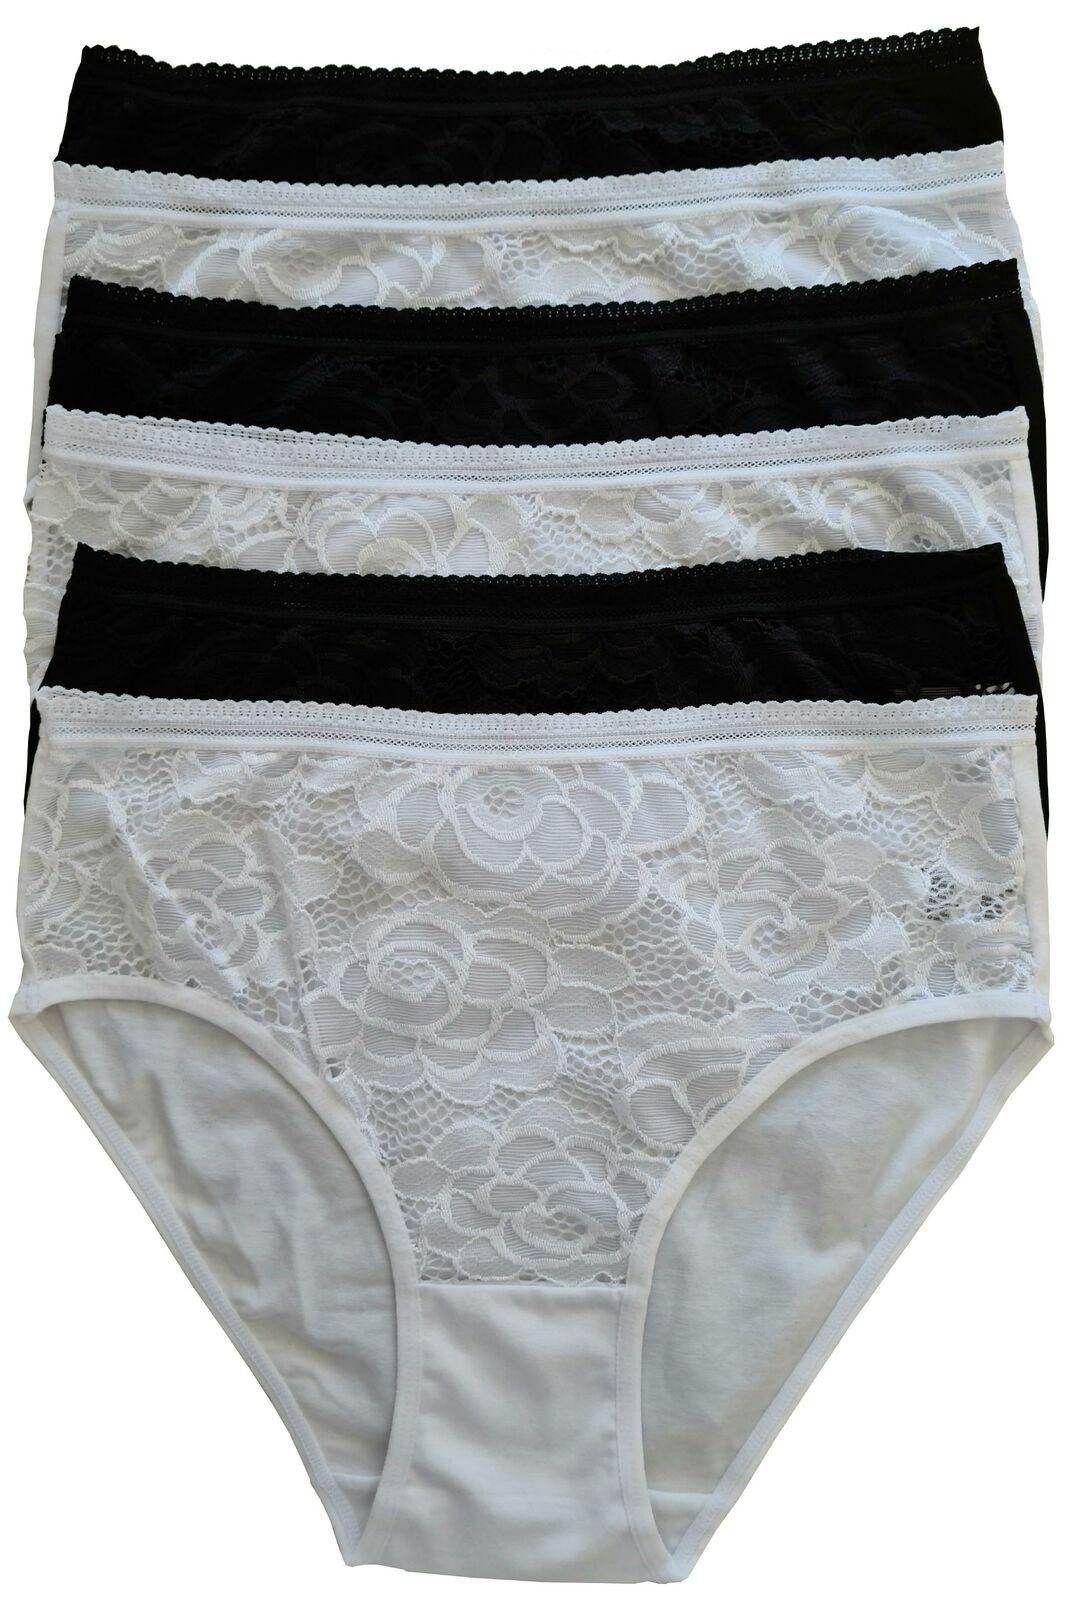 Panty Set Damen Spitze Hipster 6er Panties Pack Slips Baumwolle Unterhose sexy